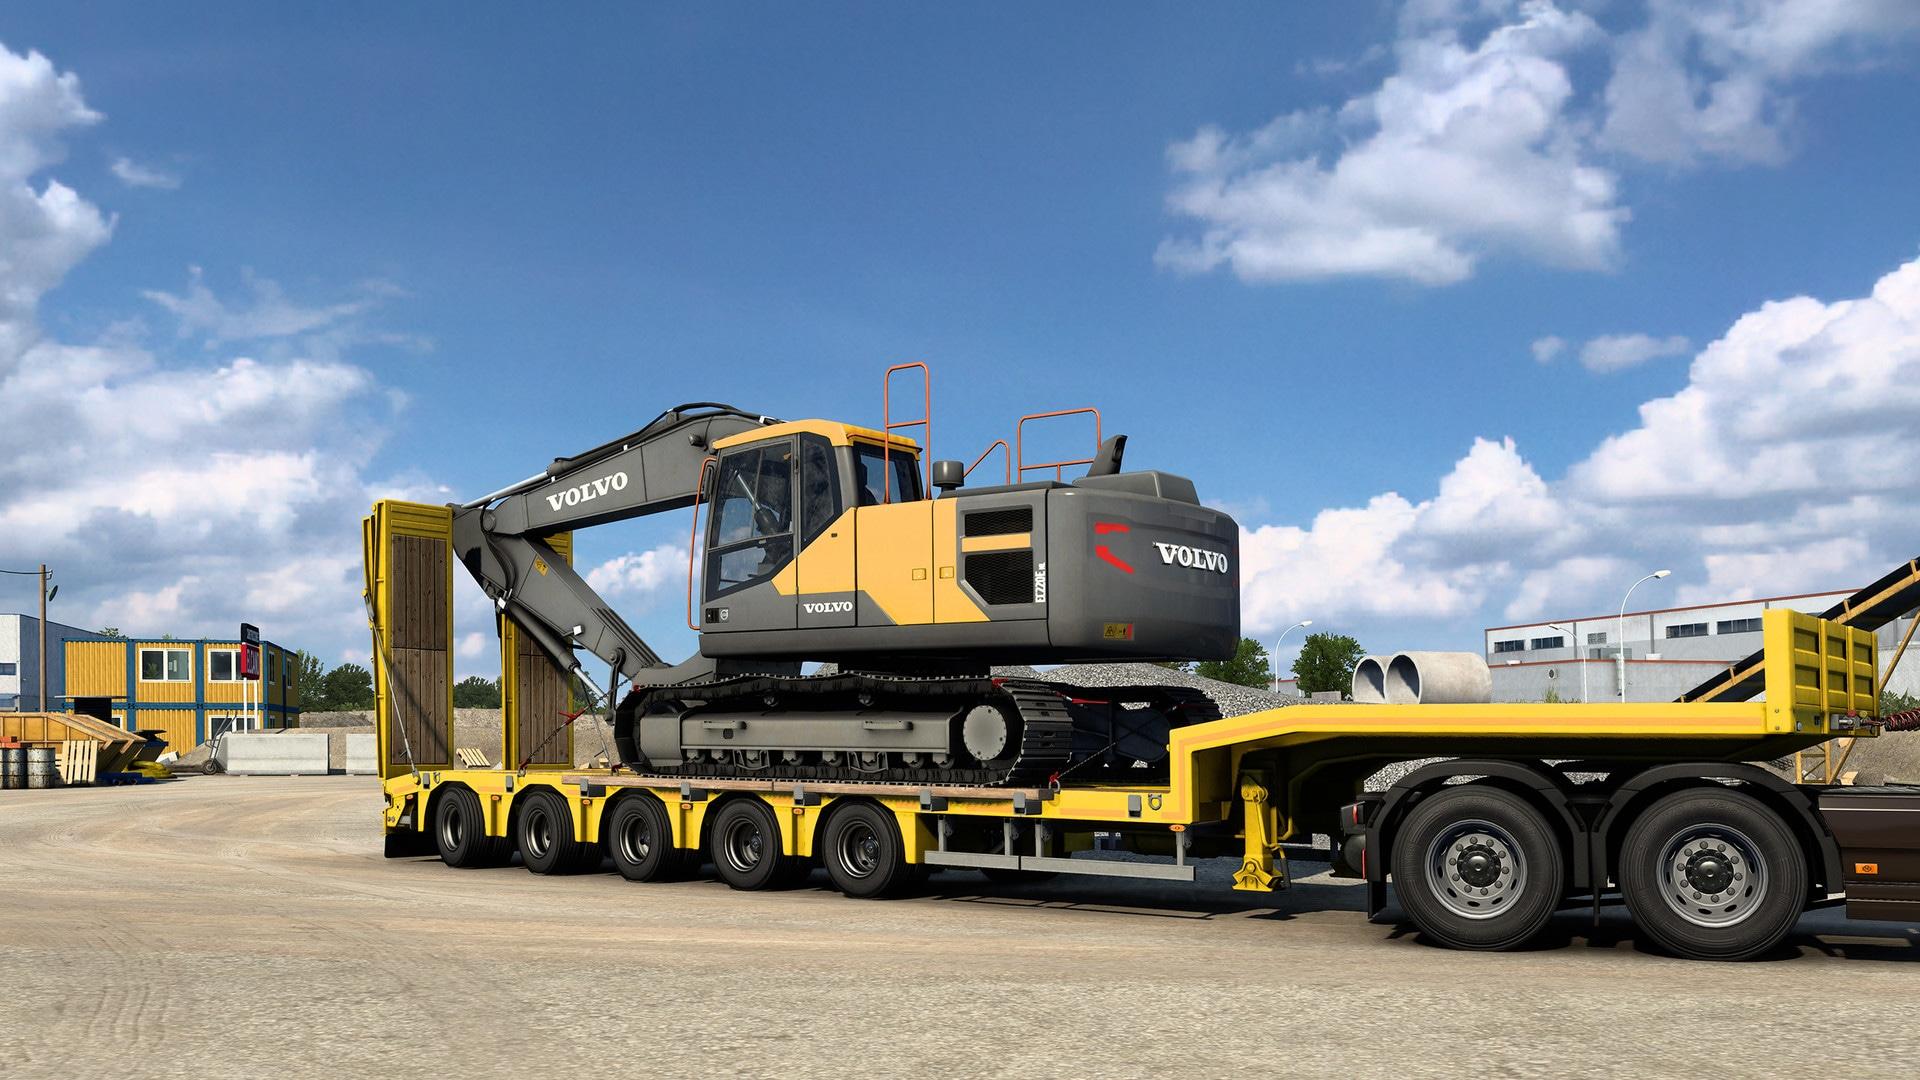 Euro Truck Simulator 2 - Volvo Construction Equipment (PC) - Steam Gift - GLOBAL - 4